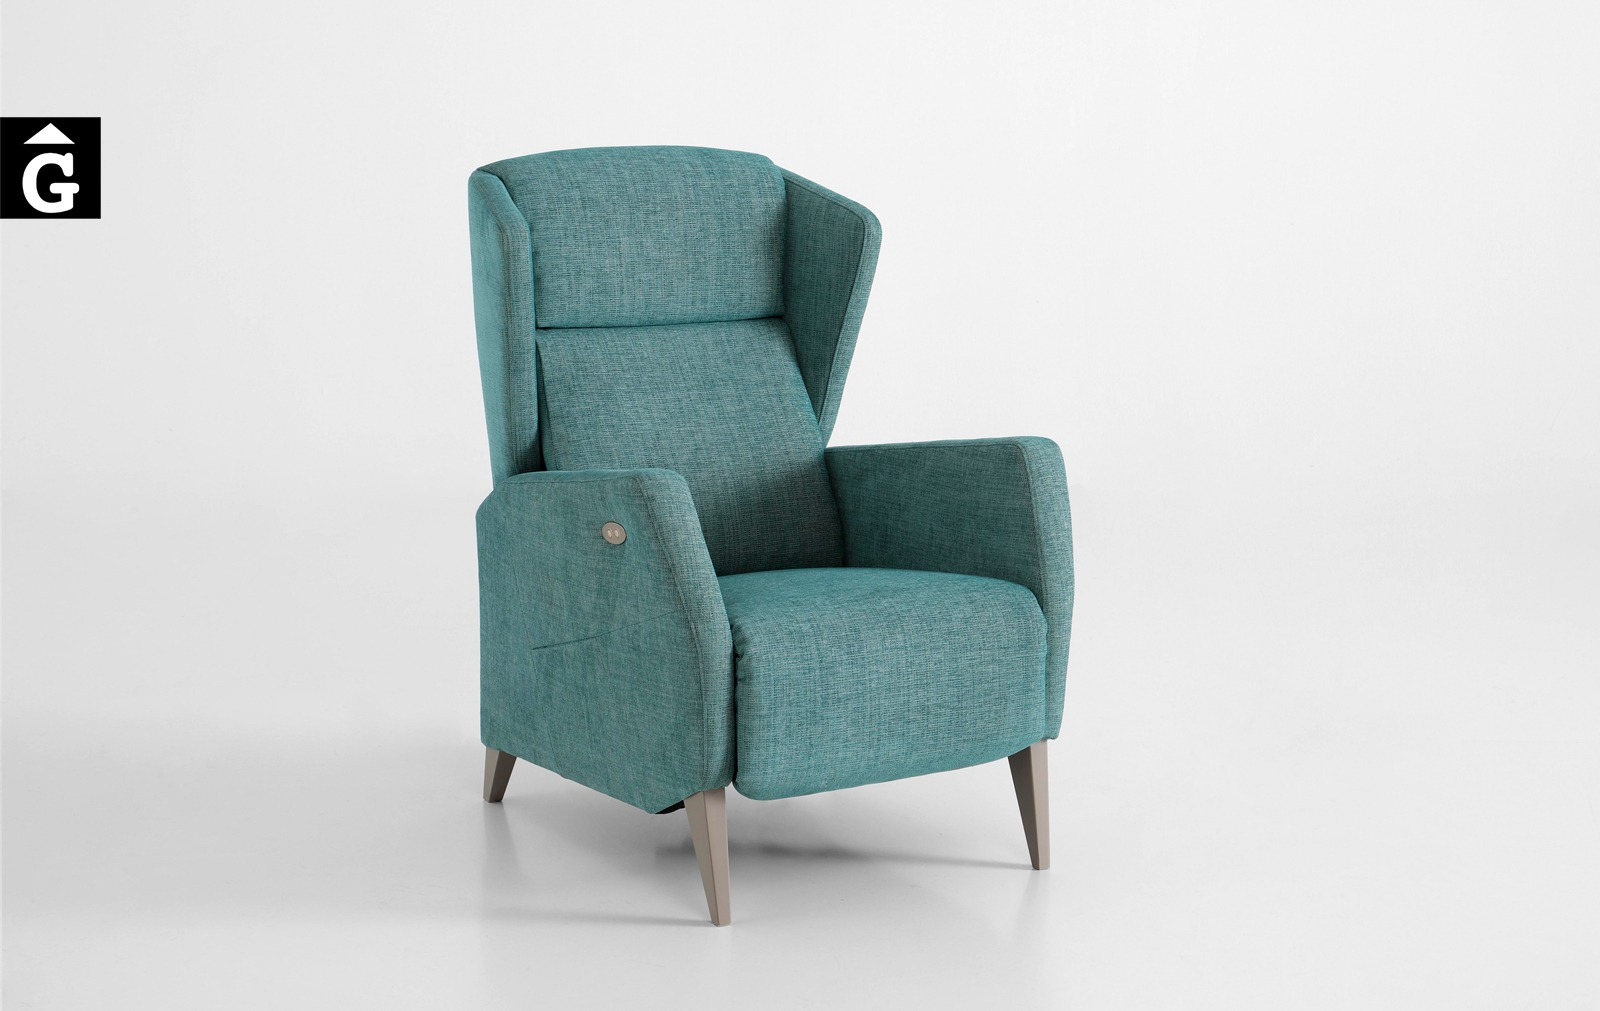 1 Tajoma by mobles Gifreu tapisseria de disseny actual i classic relax butaques sillons